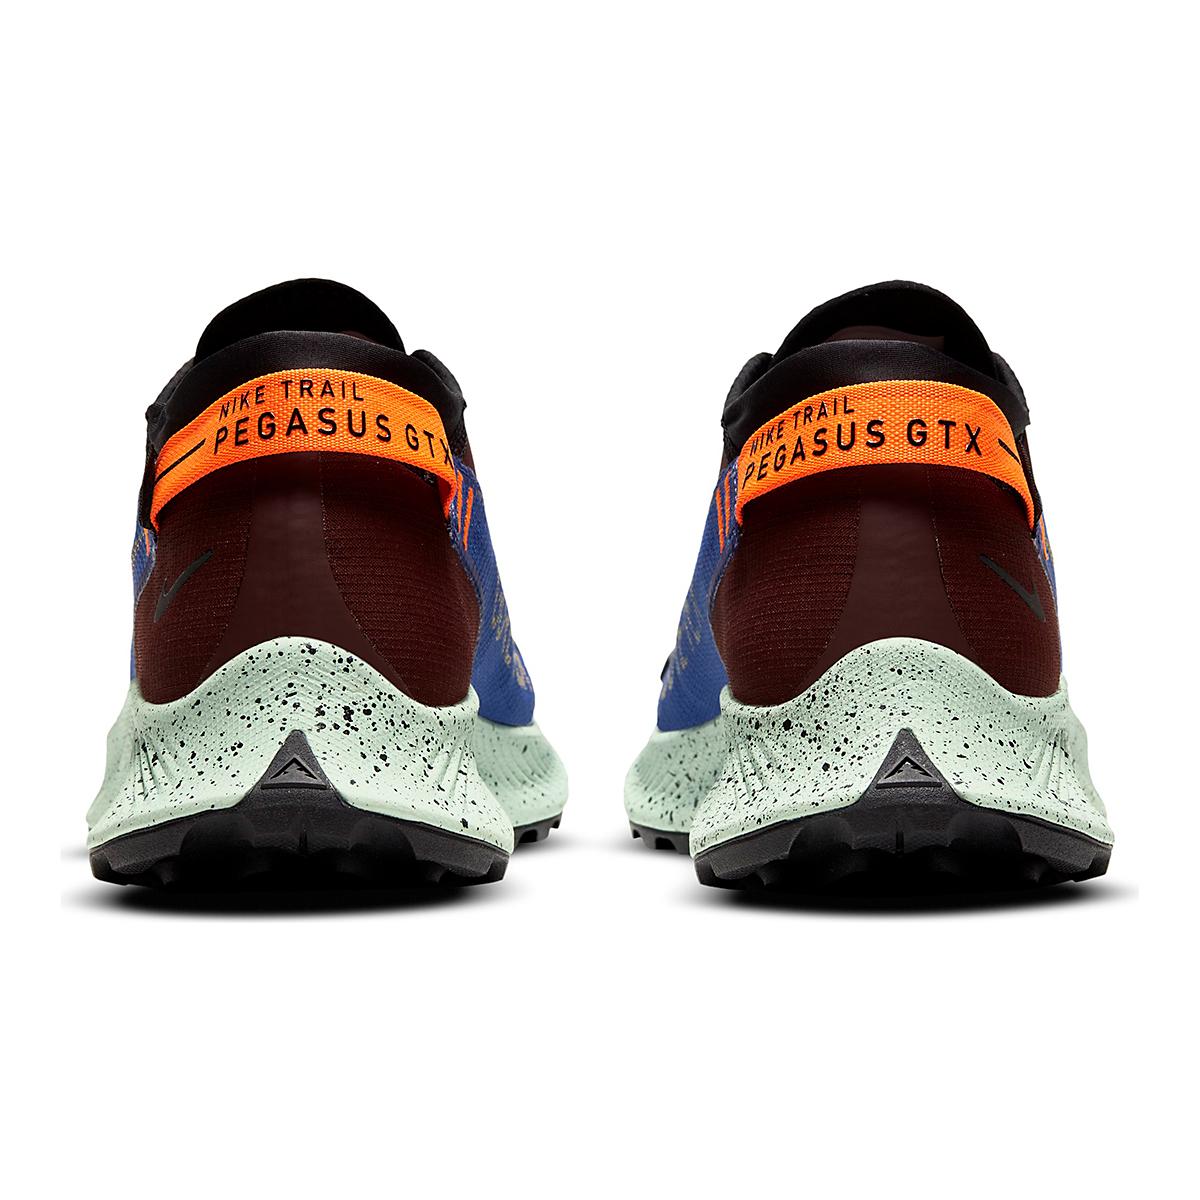 Men's Nike Pegasus Trail 2 Gore-Tex Running Shoe - Color: Mystic Dates/Laser Orange/ Astronomy Blue - Size: 6 - Width: Regular, Mystic Dates/Laser Orange/ Astronomy Blue, large, image 4